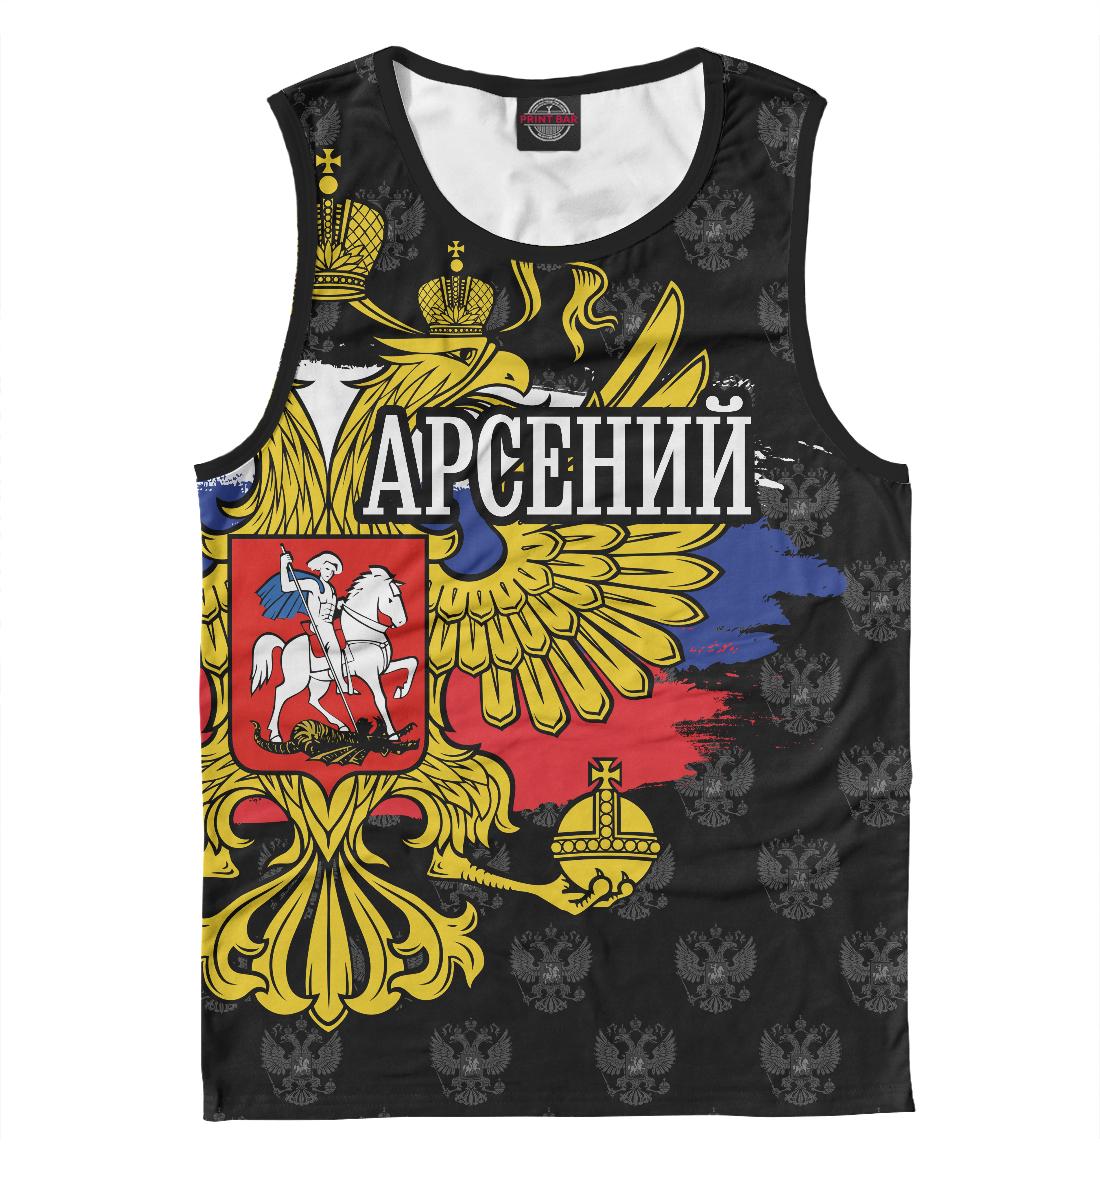 Арсений (герб России) недорого